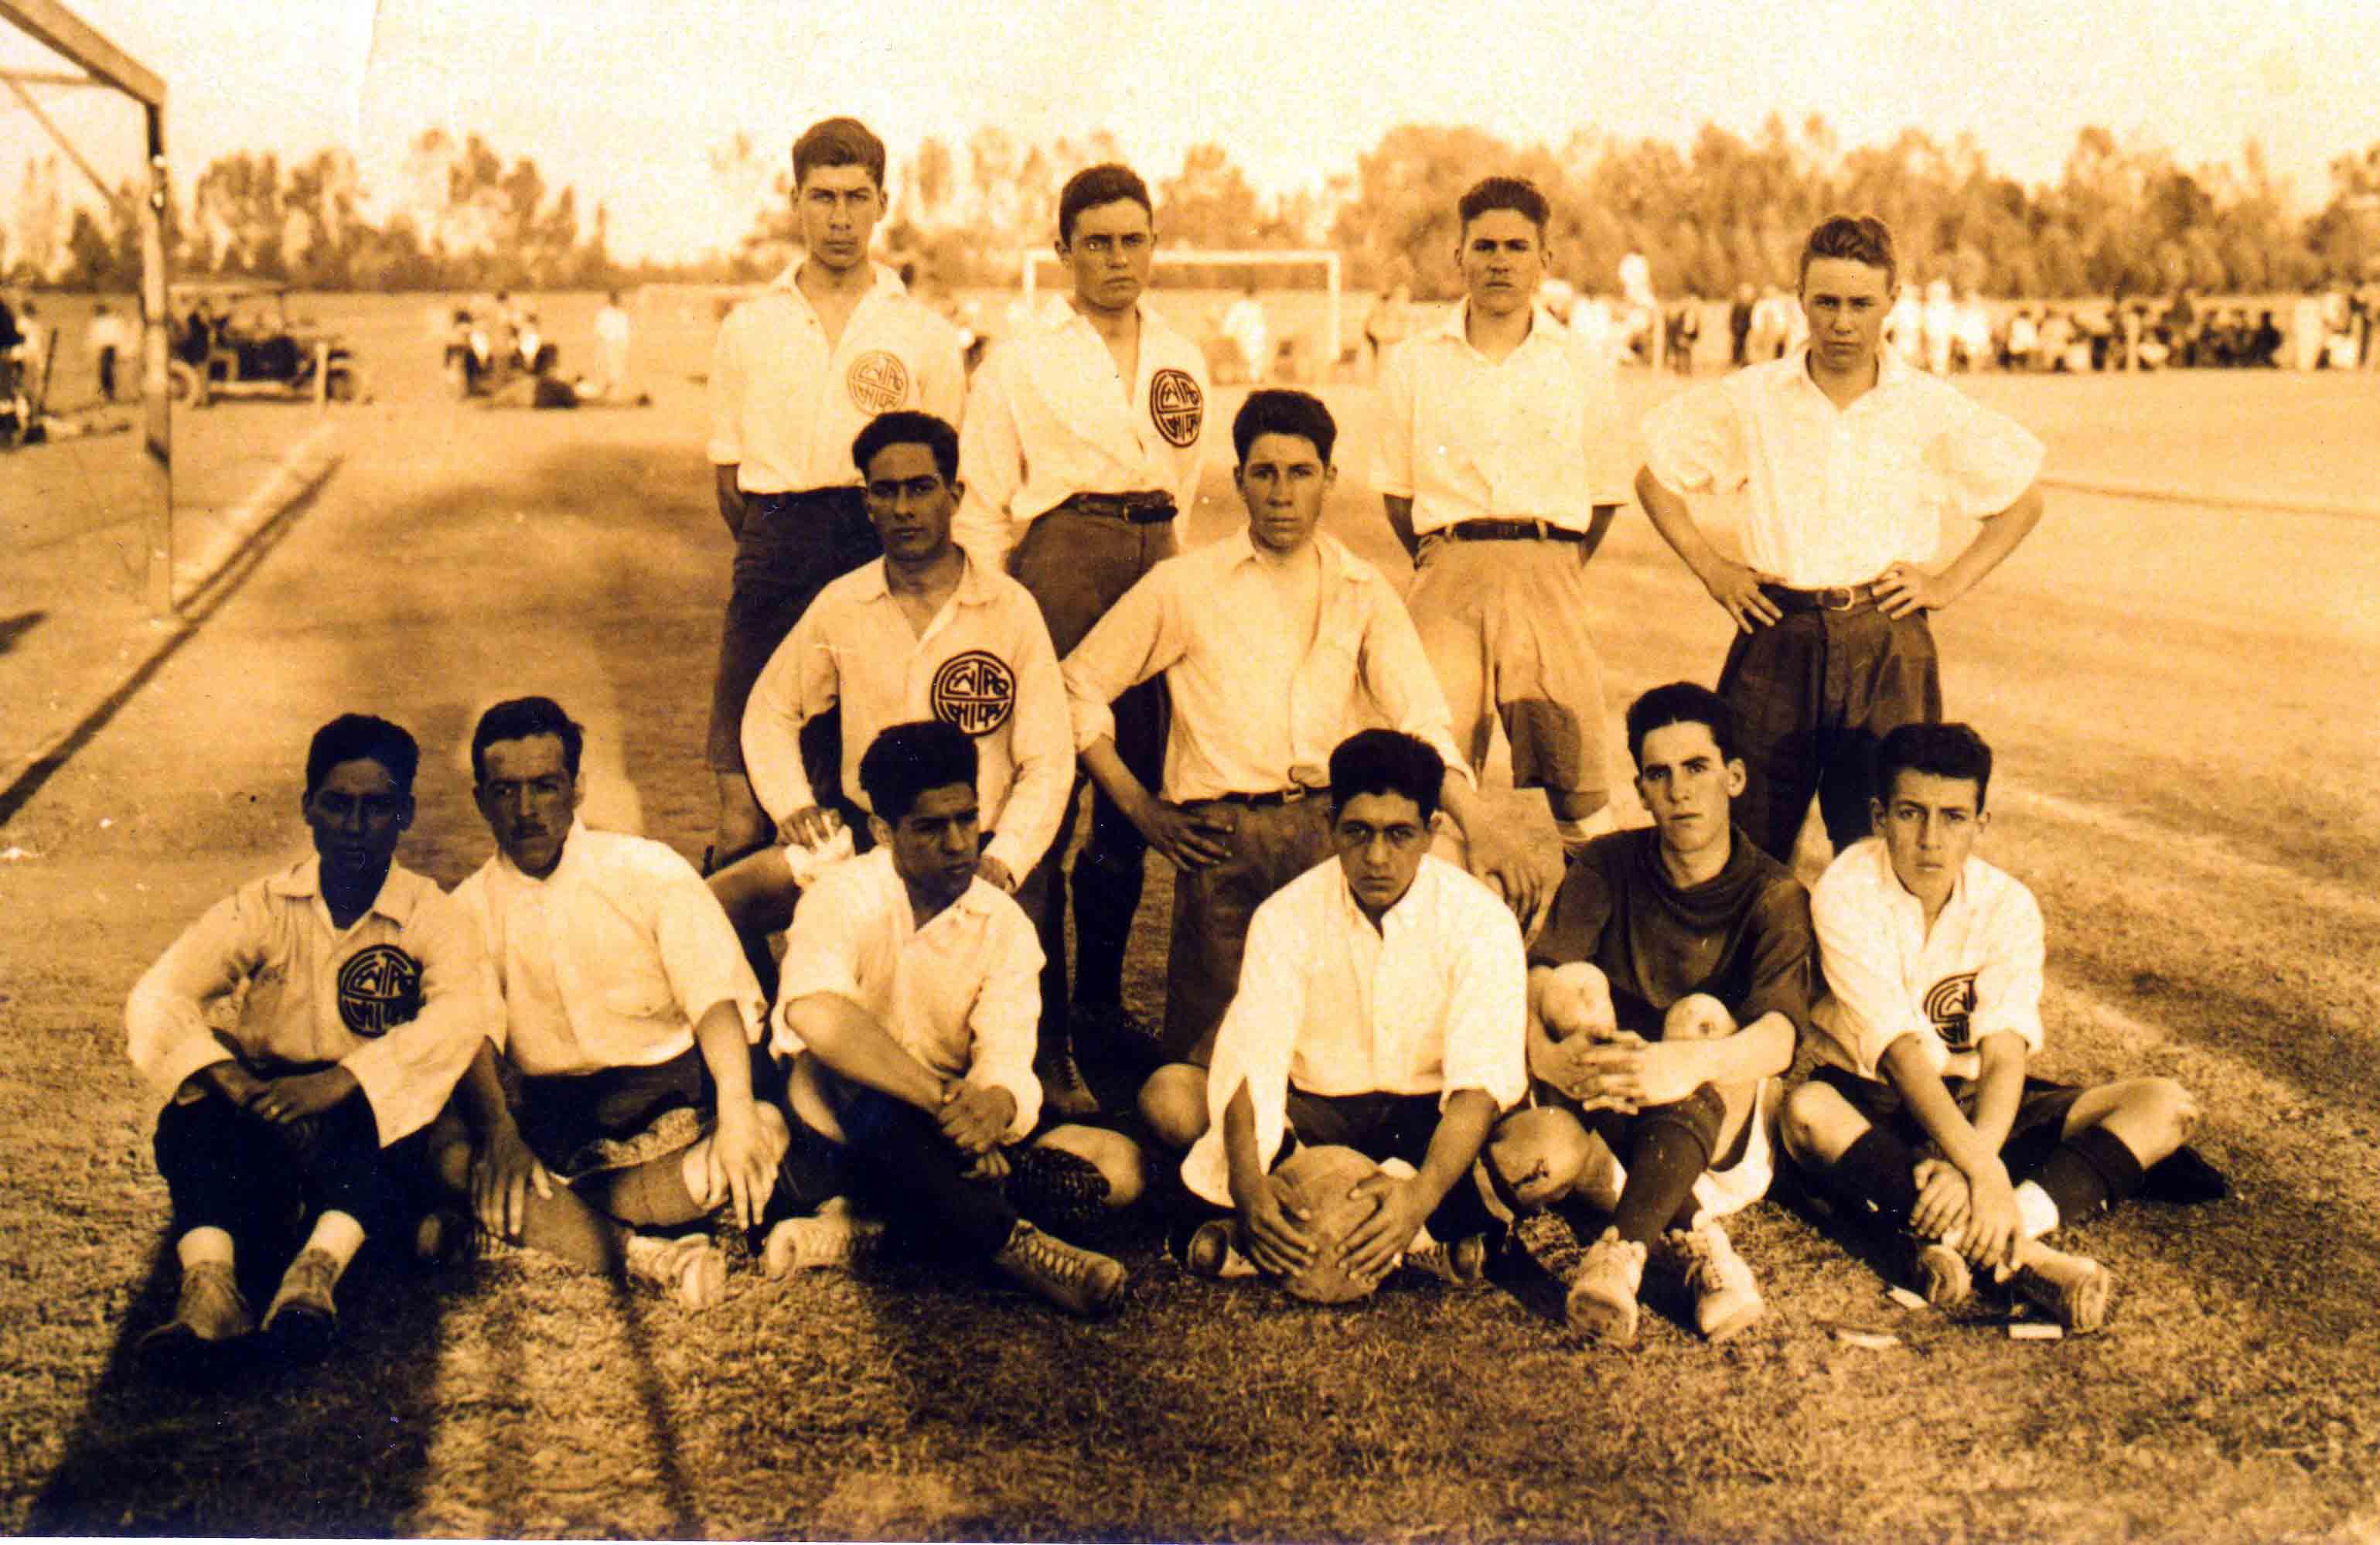 c9510644ce9ec Historia   Club América - Sitio Oficial